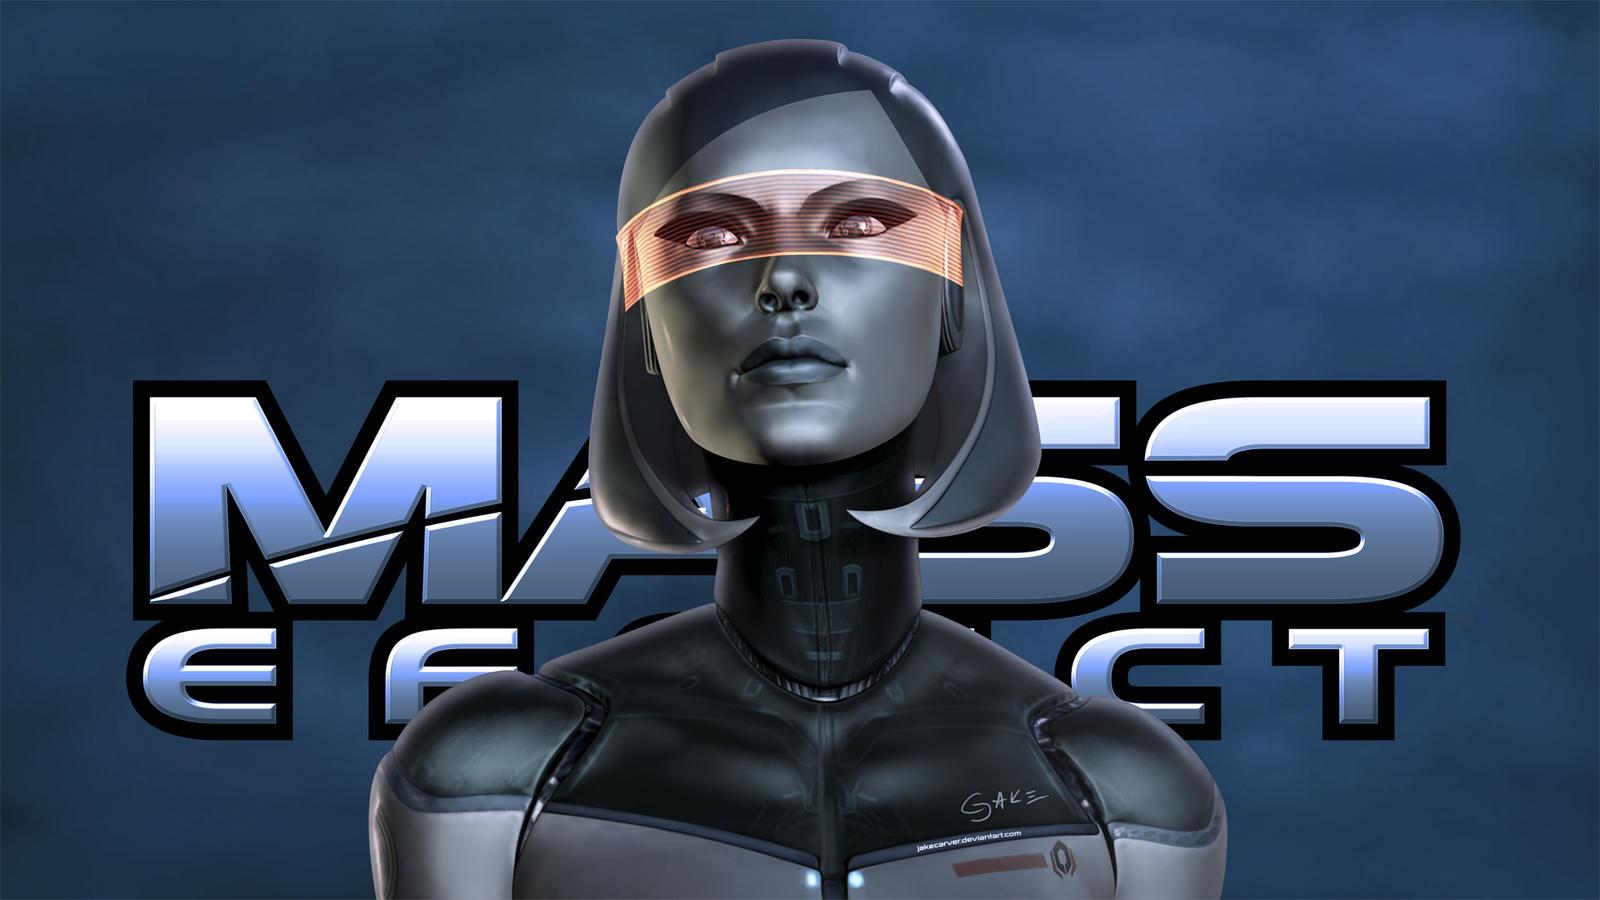 EDI. Mass Effect Wallpaper by JakeCarver on DeviantArt